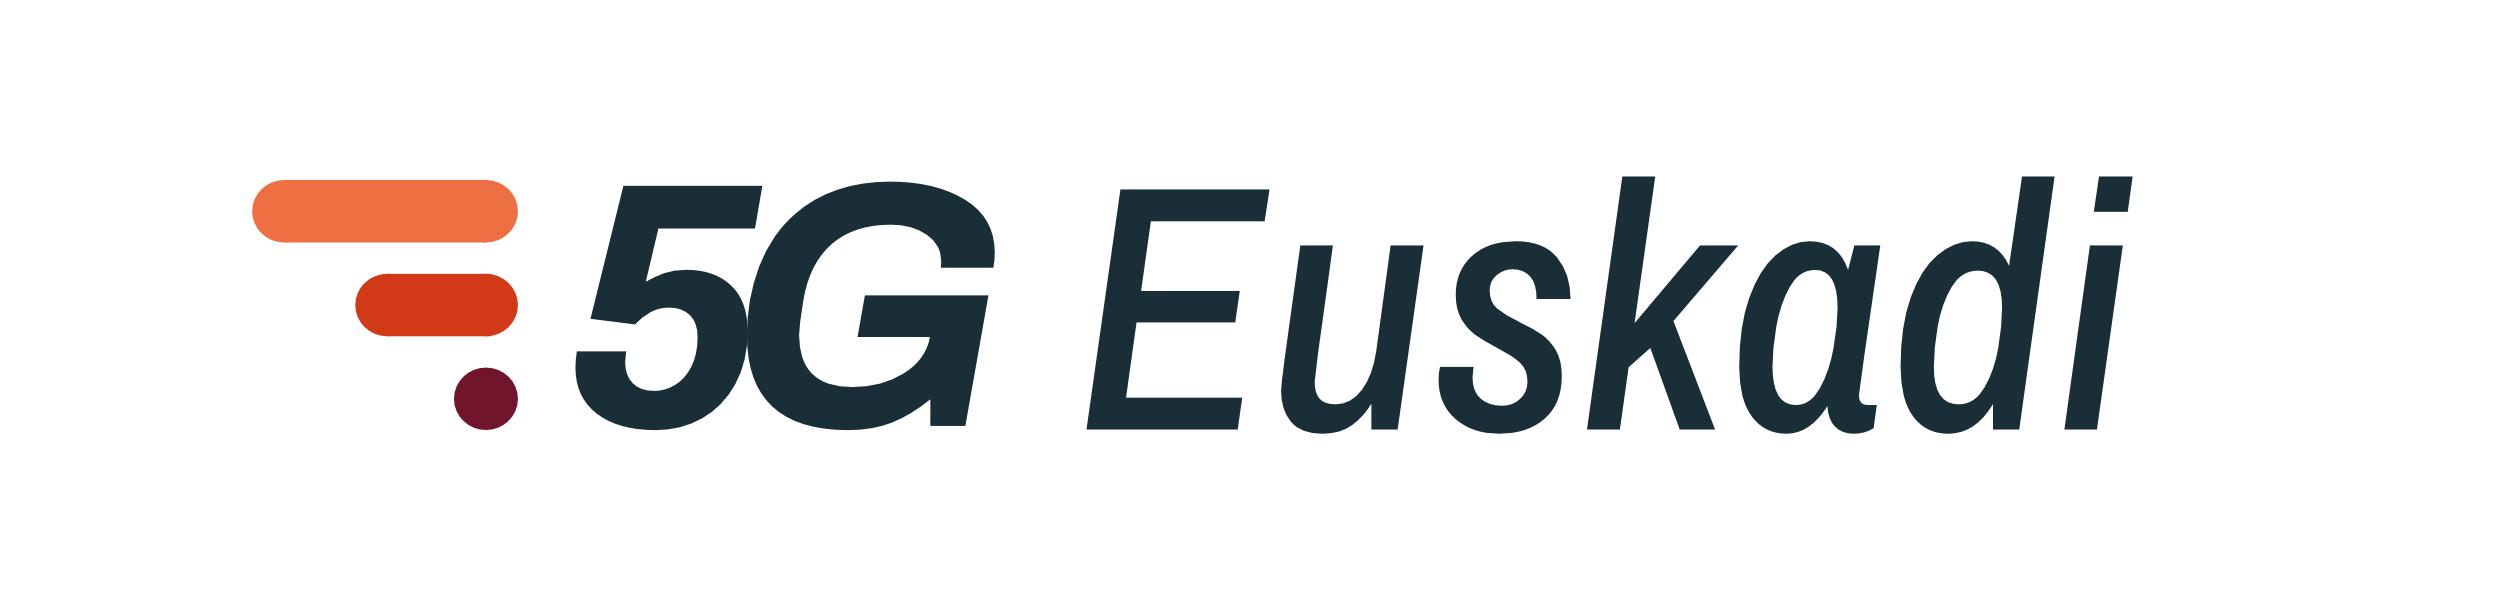 5G Euskadi